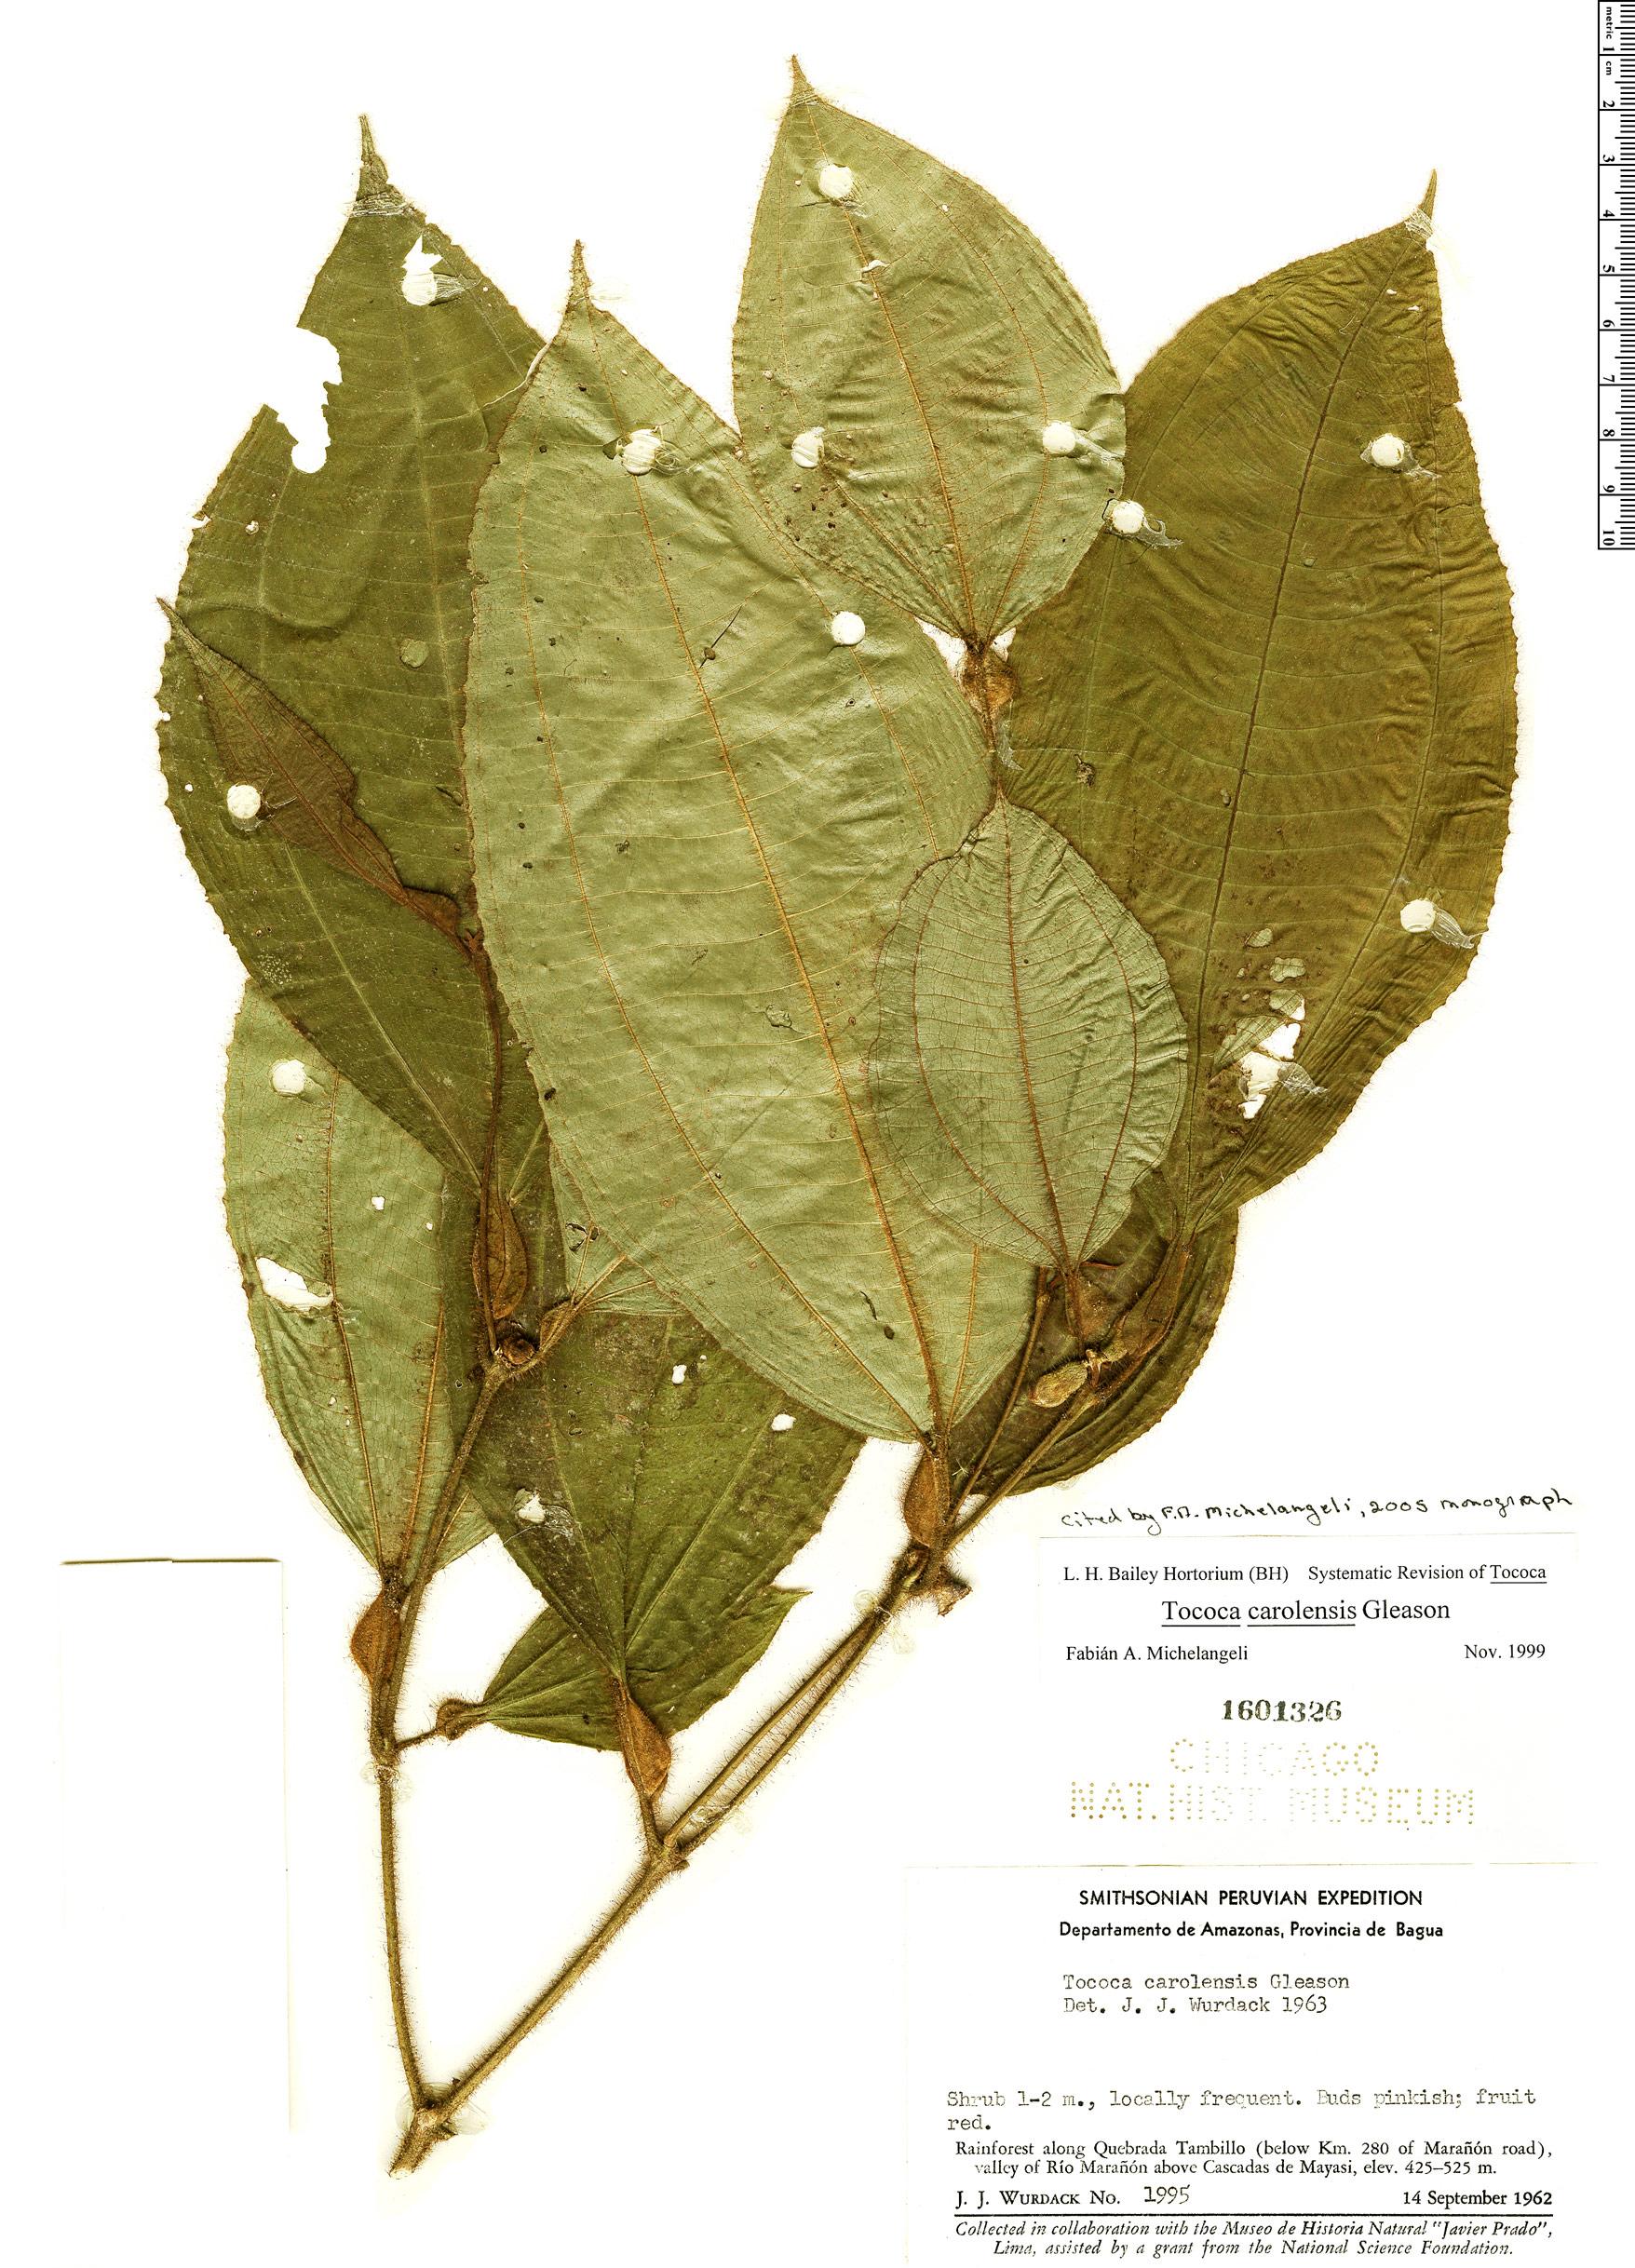 Specimen: Tococa carolensis